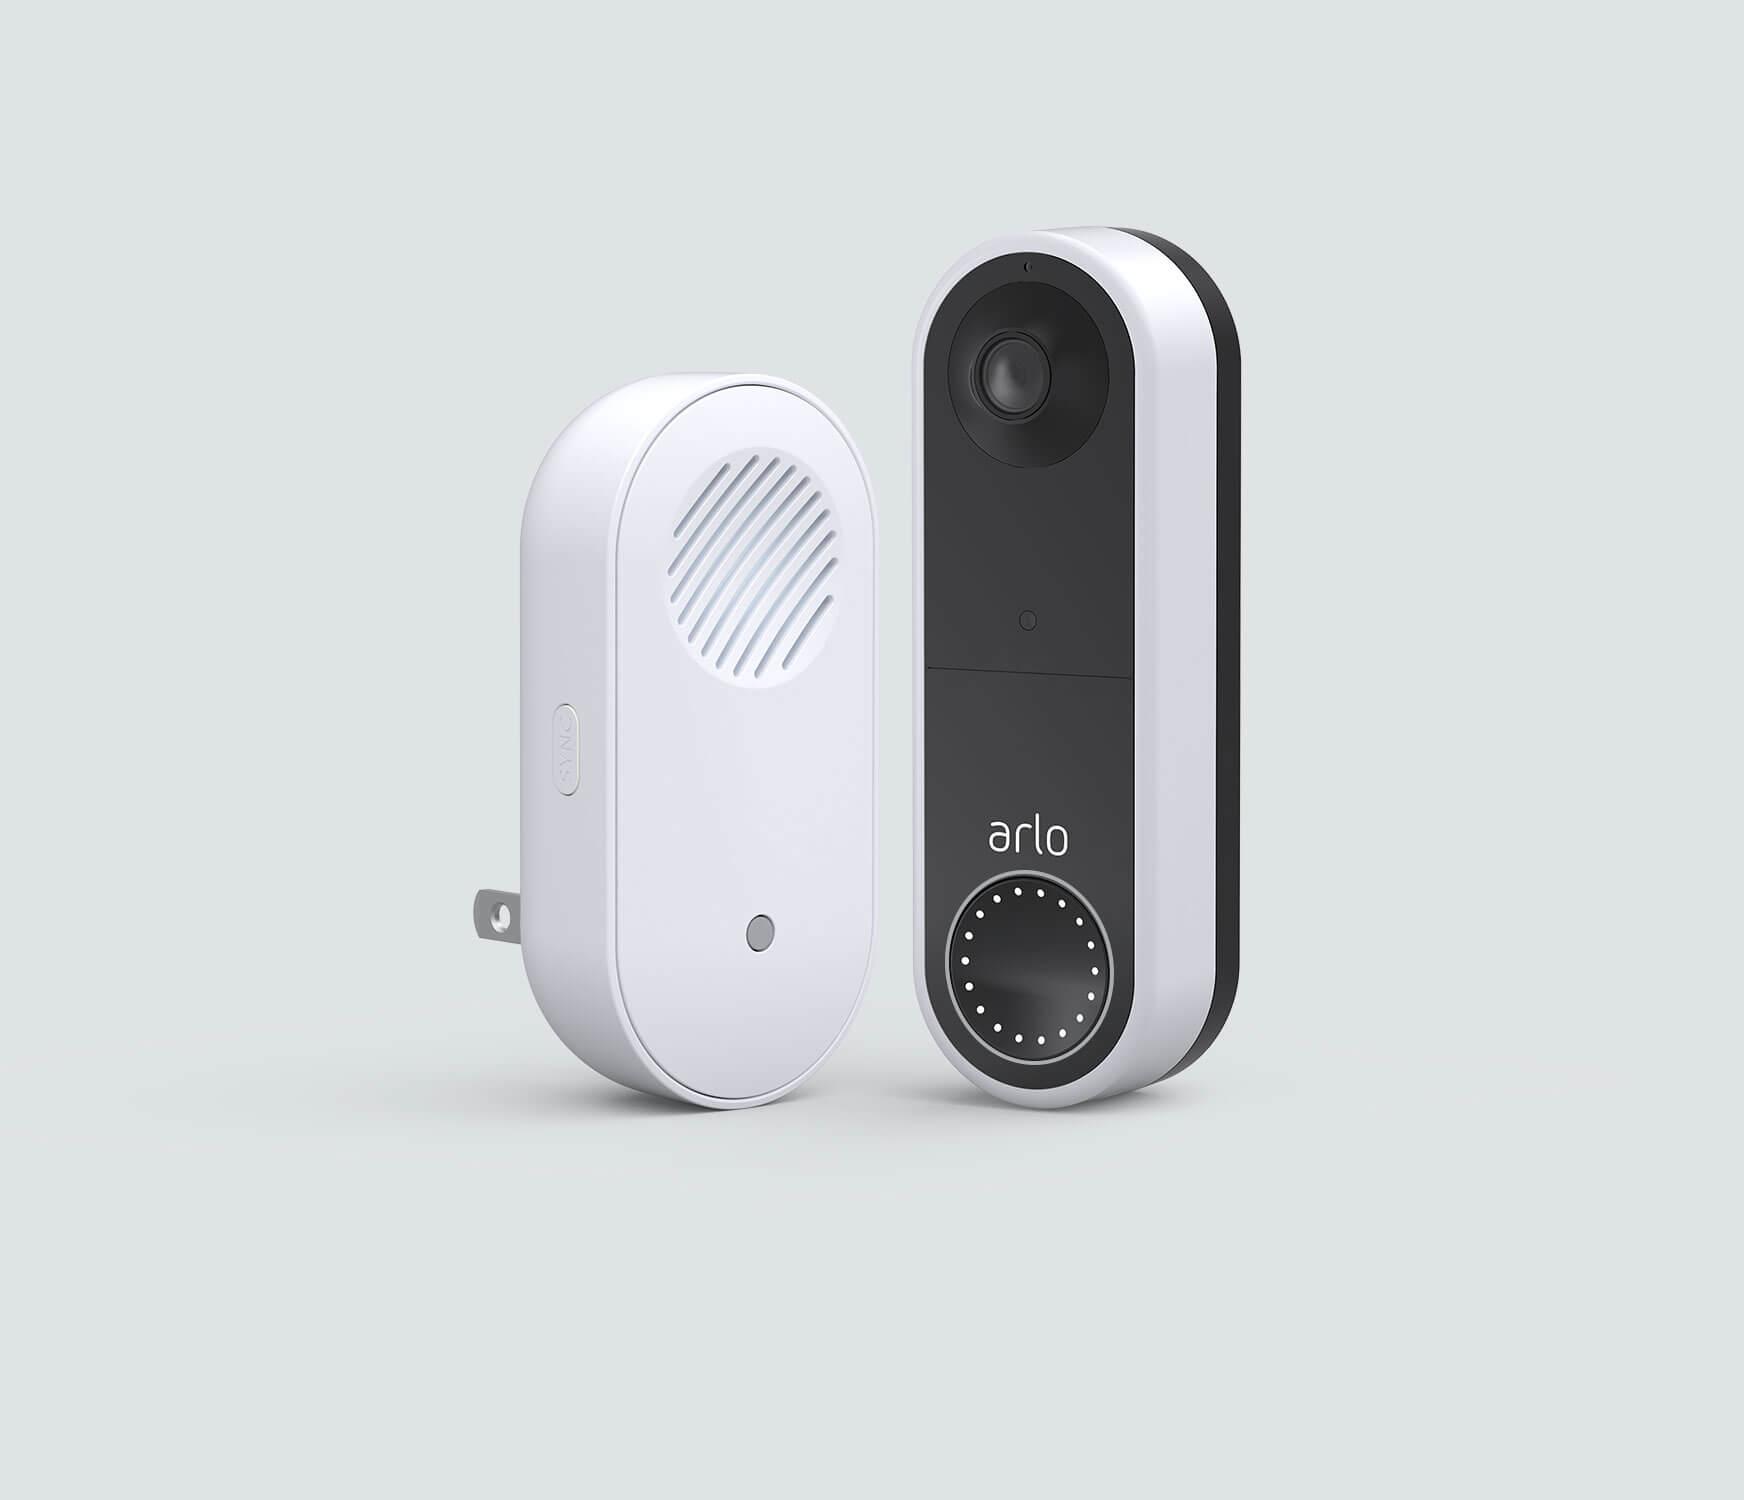 The Wireless Doorbell & Chime Bundle